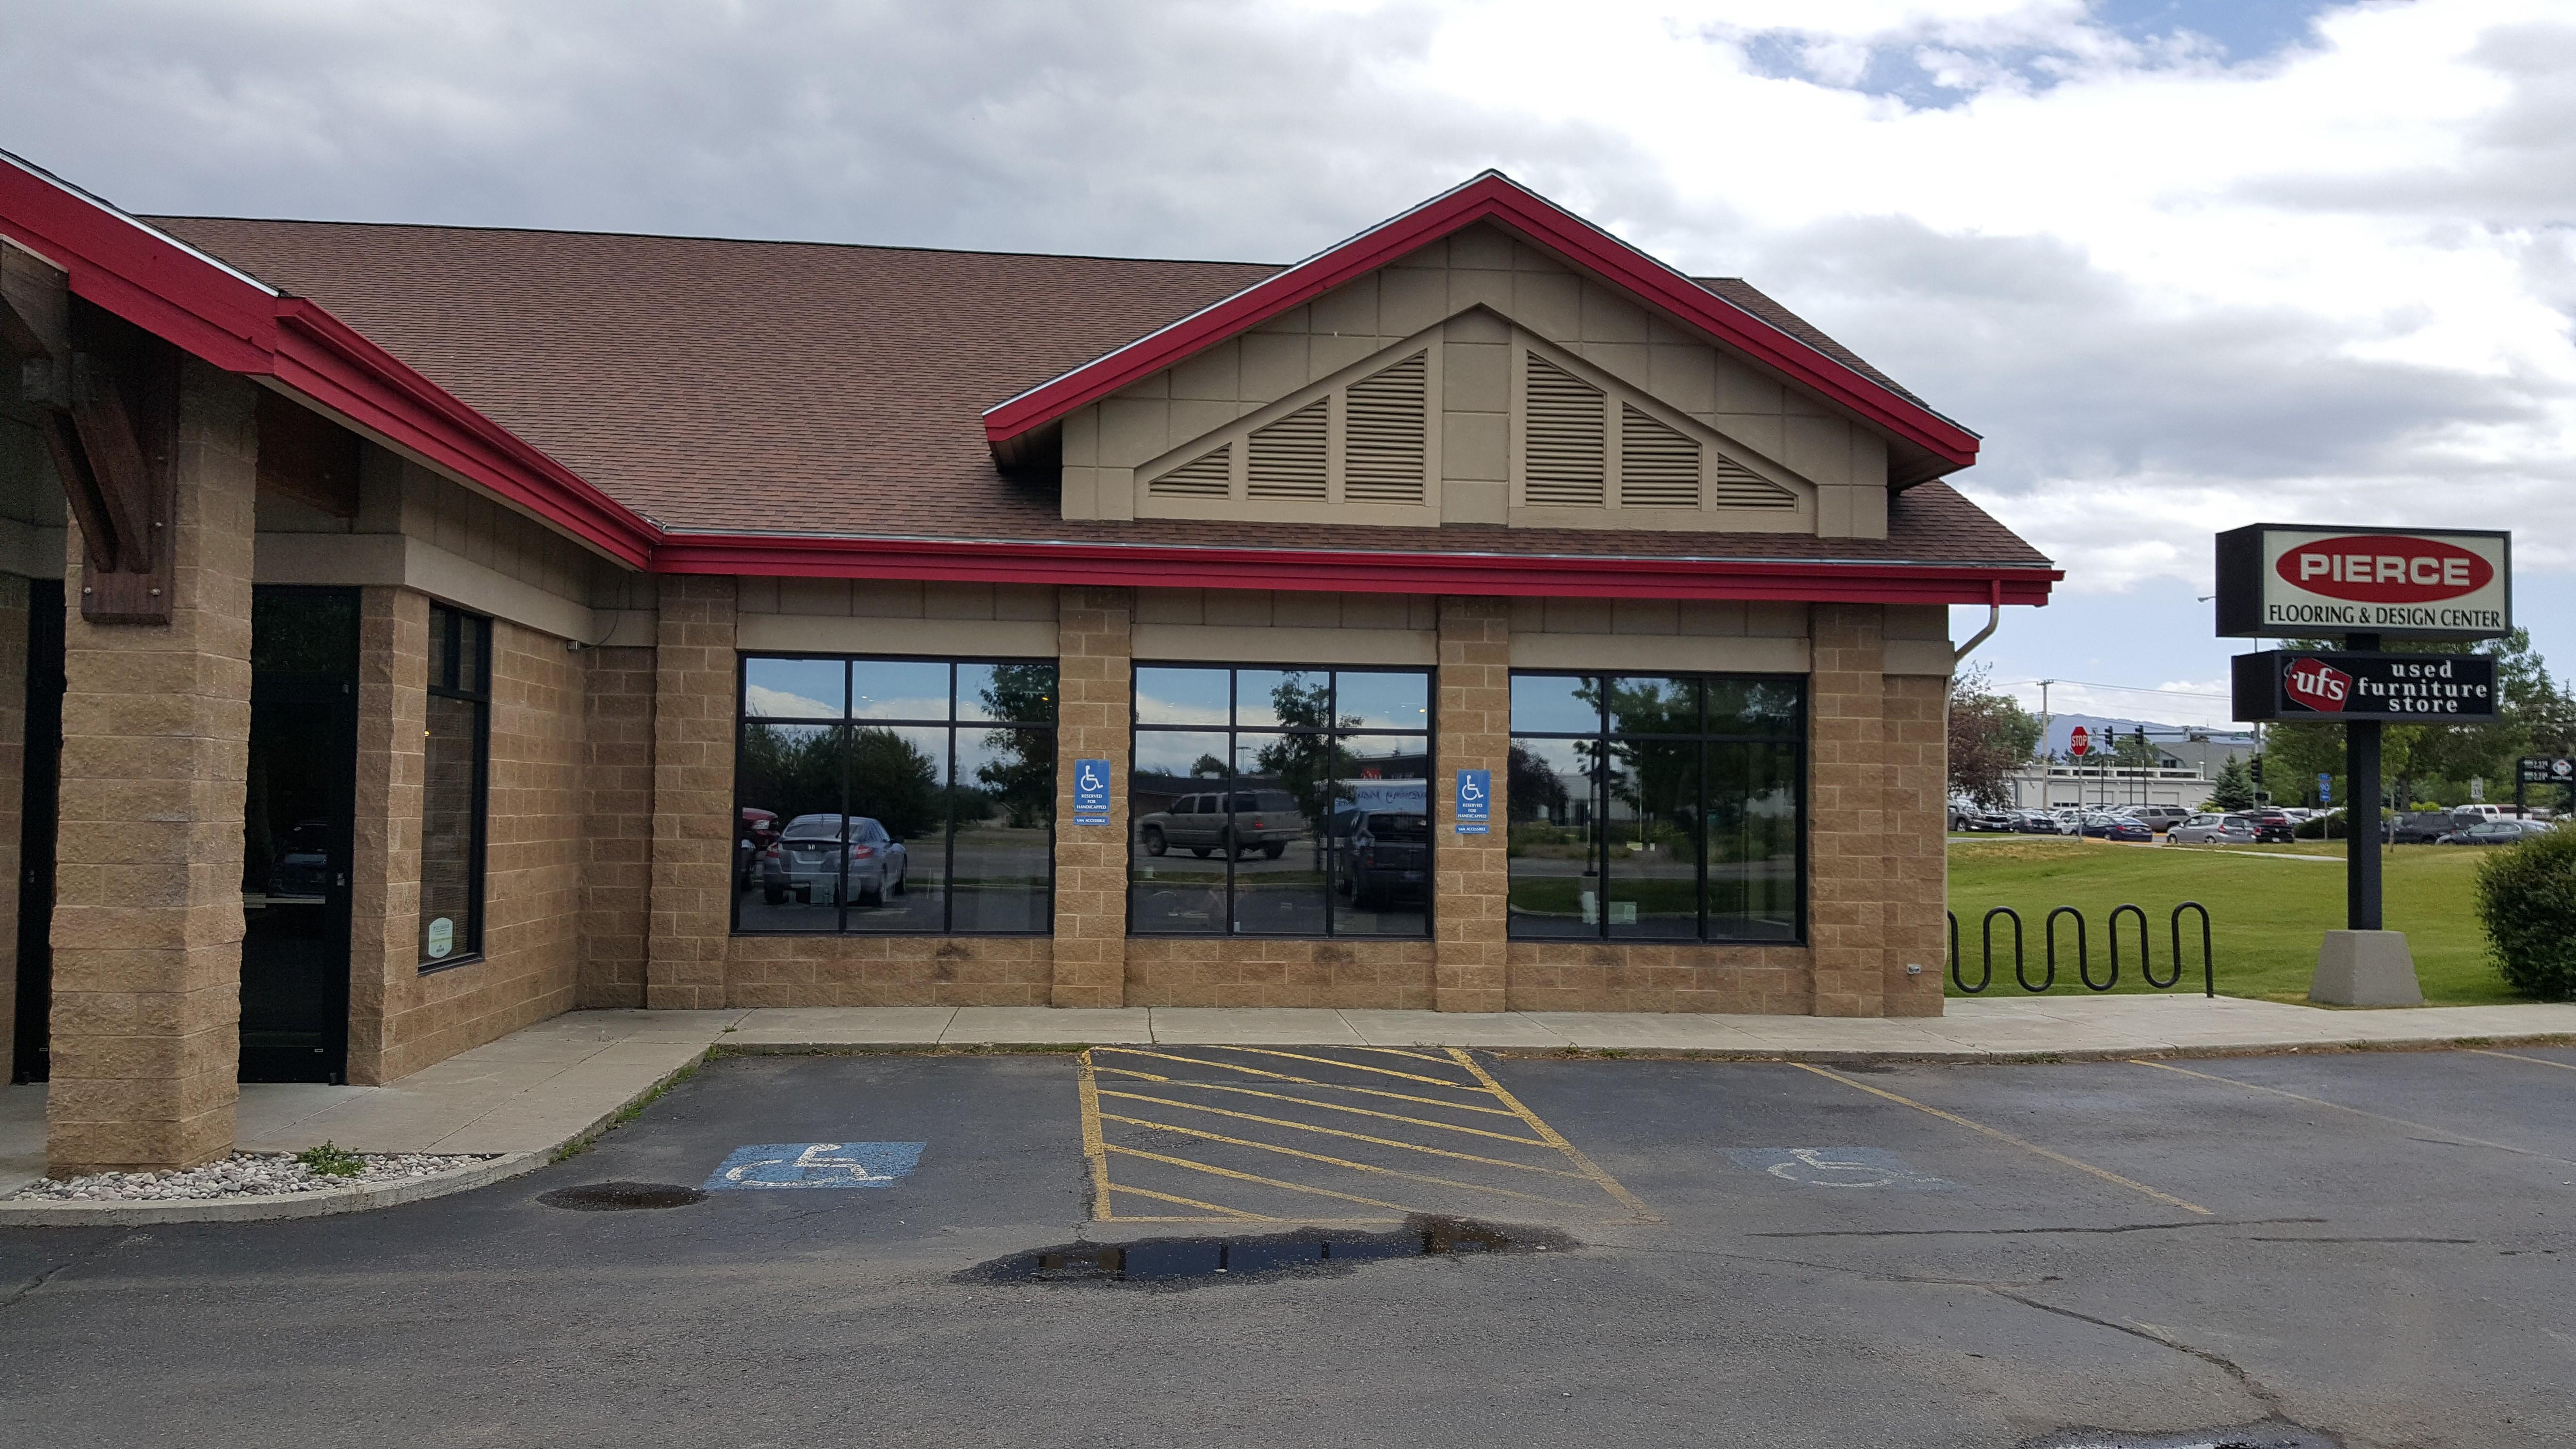 Bozeman Mt Commercial Window Tinting For Pierce Flooring Company